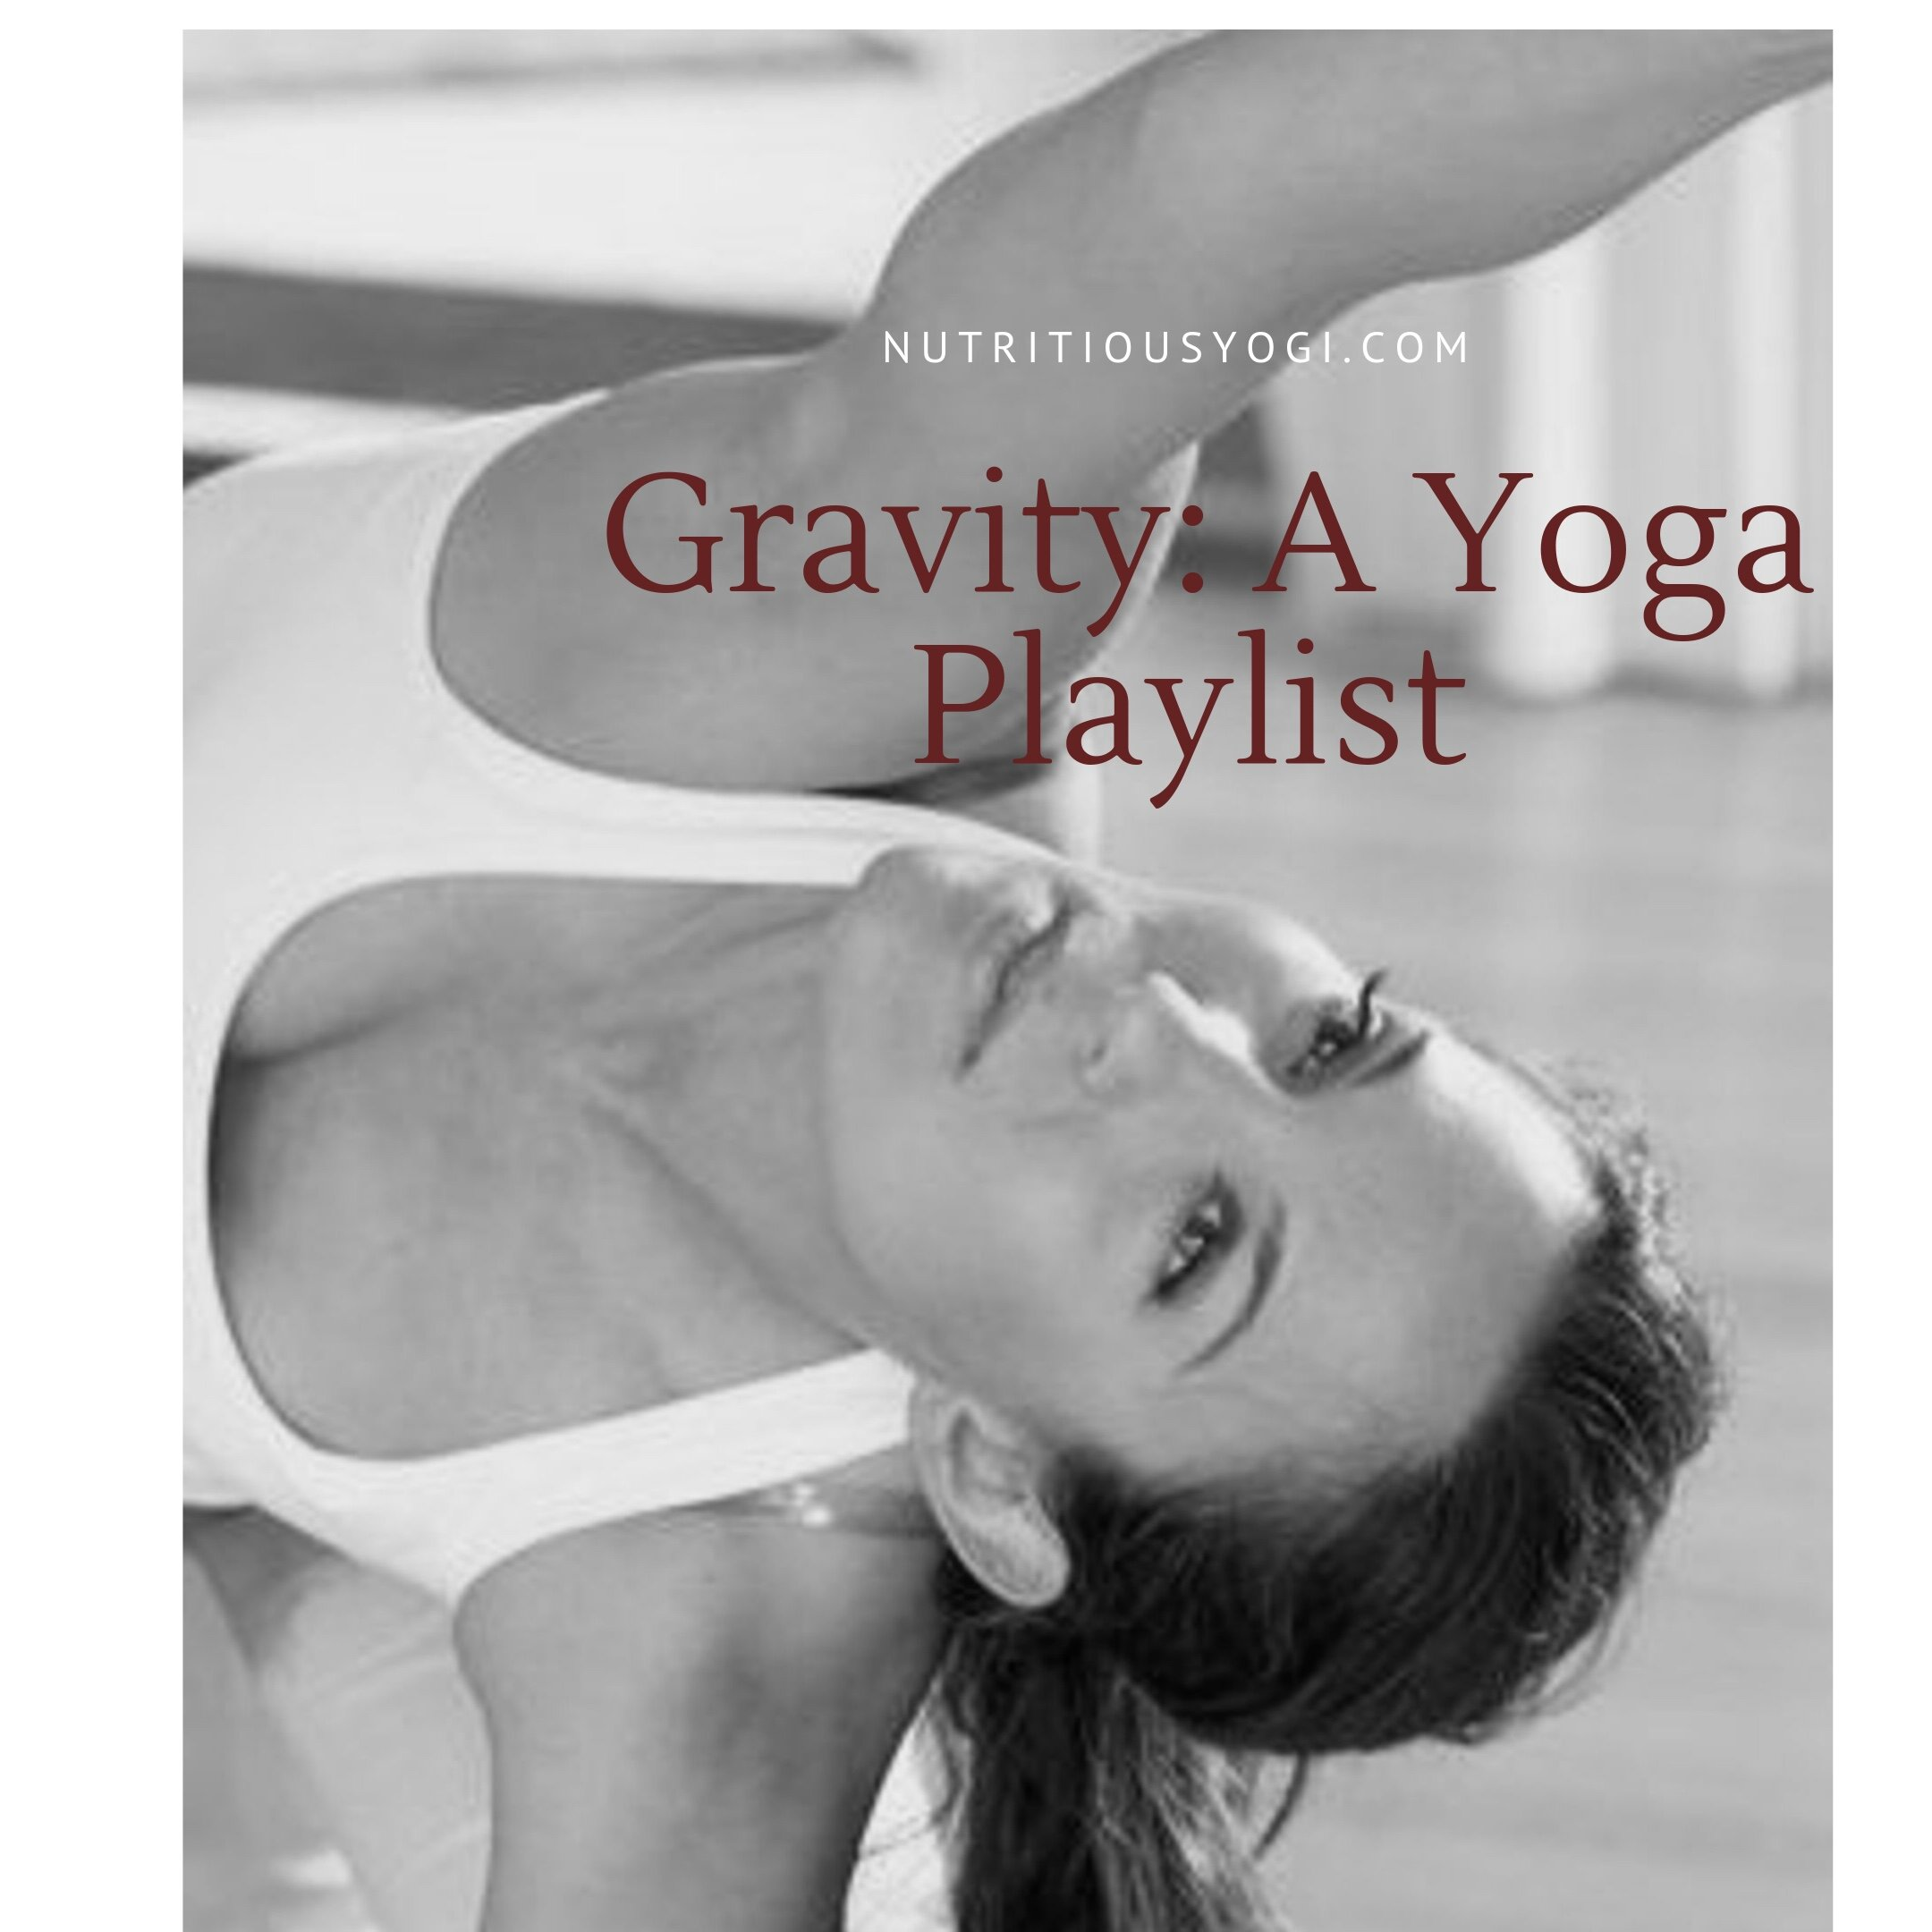 Coffee-house inspired yoga playlist